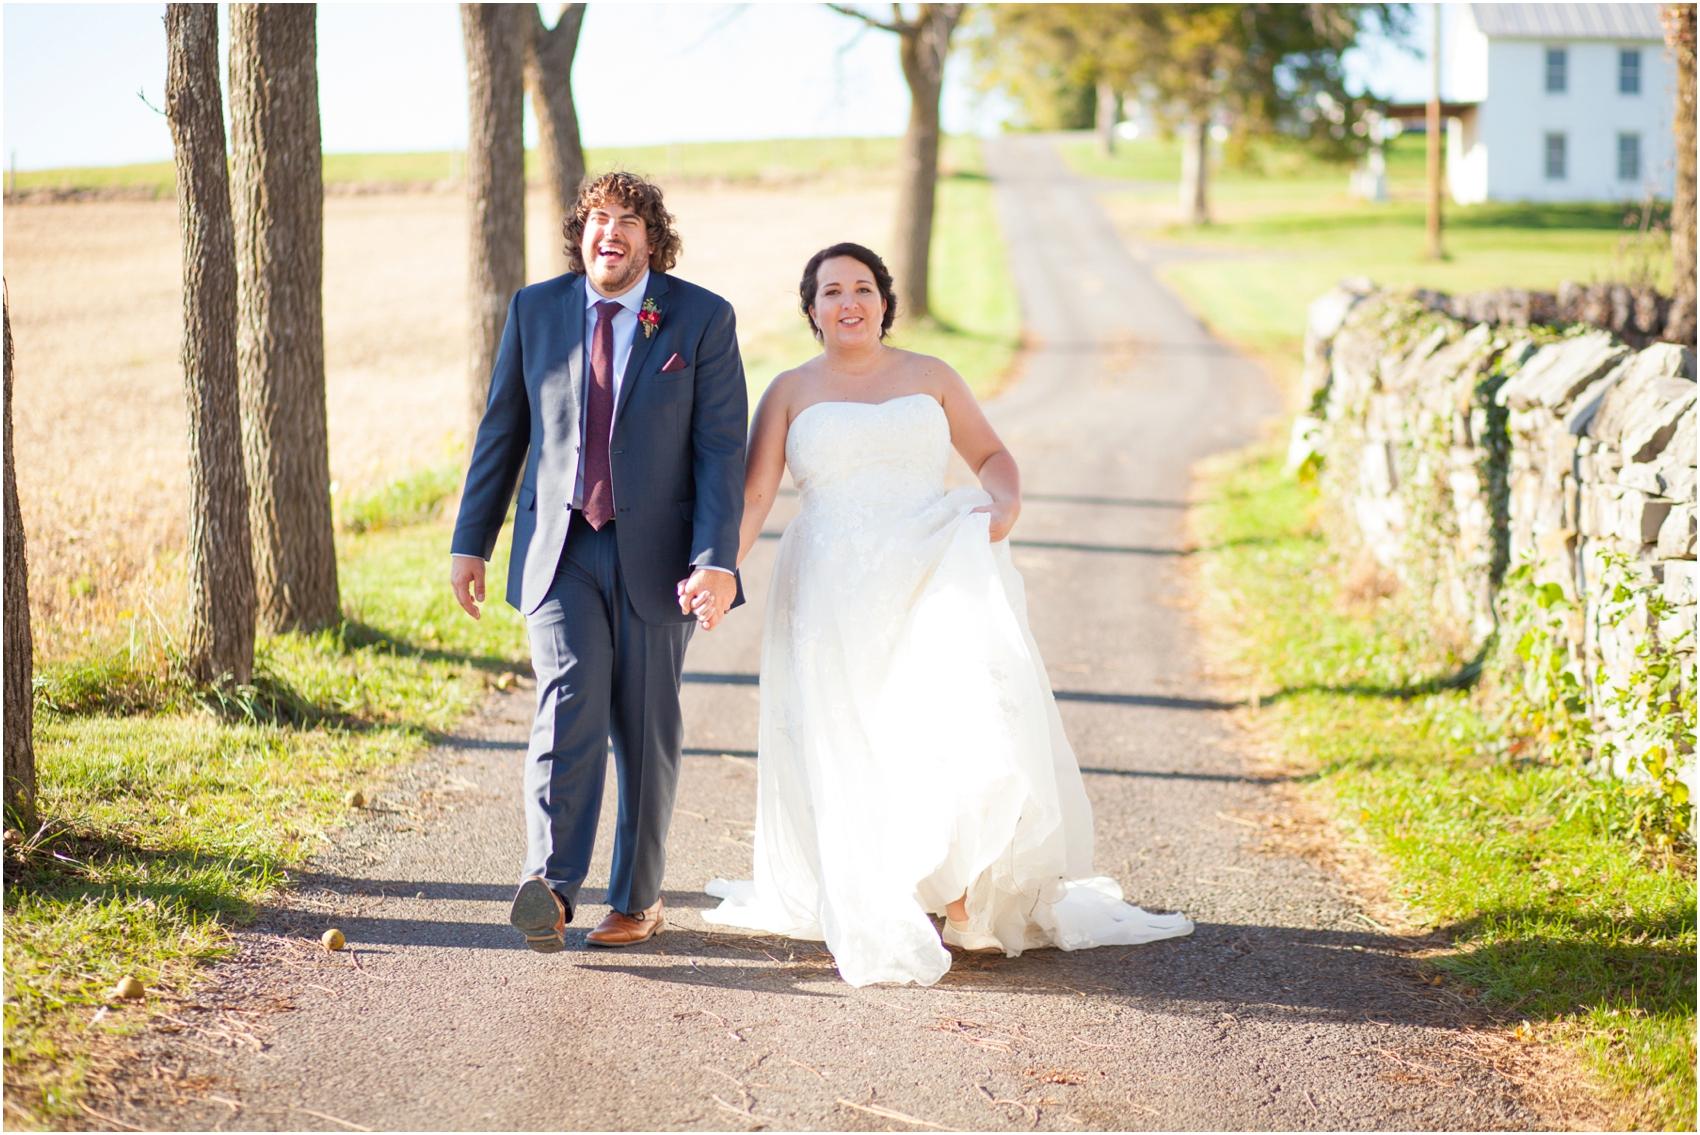 On-Sunny-Slope-Farm-Fall-Virginia-Wedding-3082.jpg